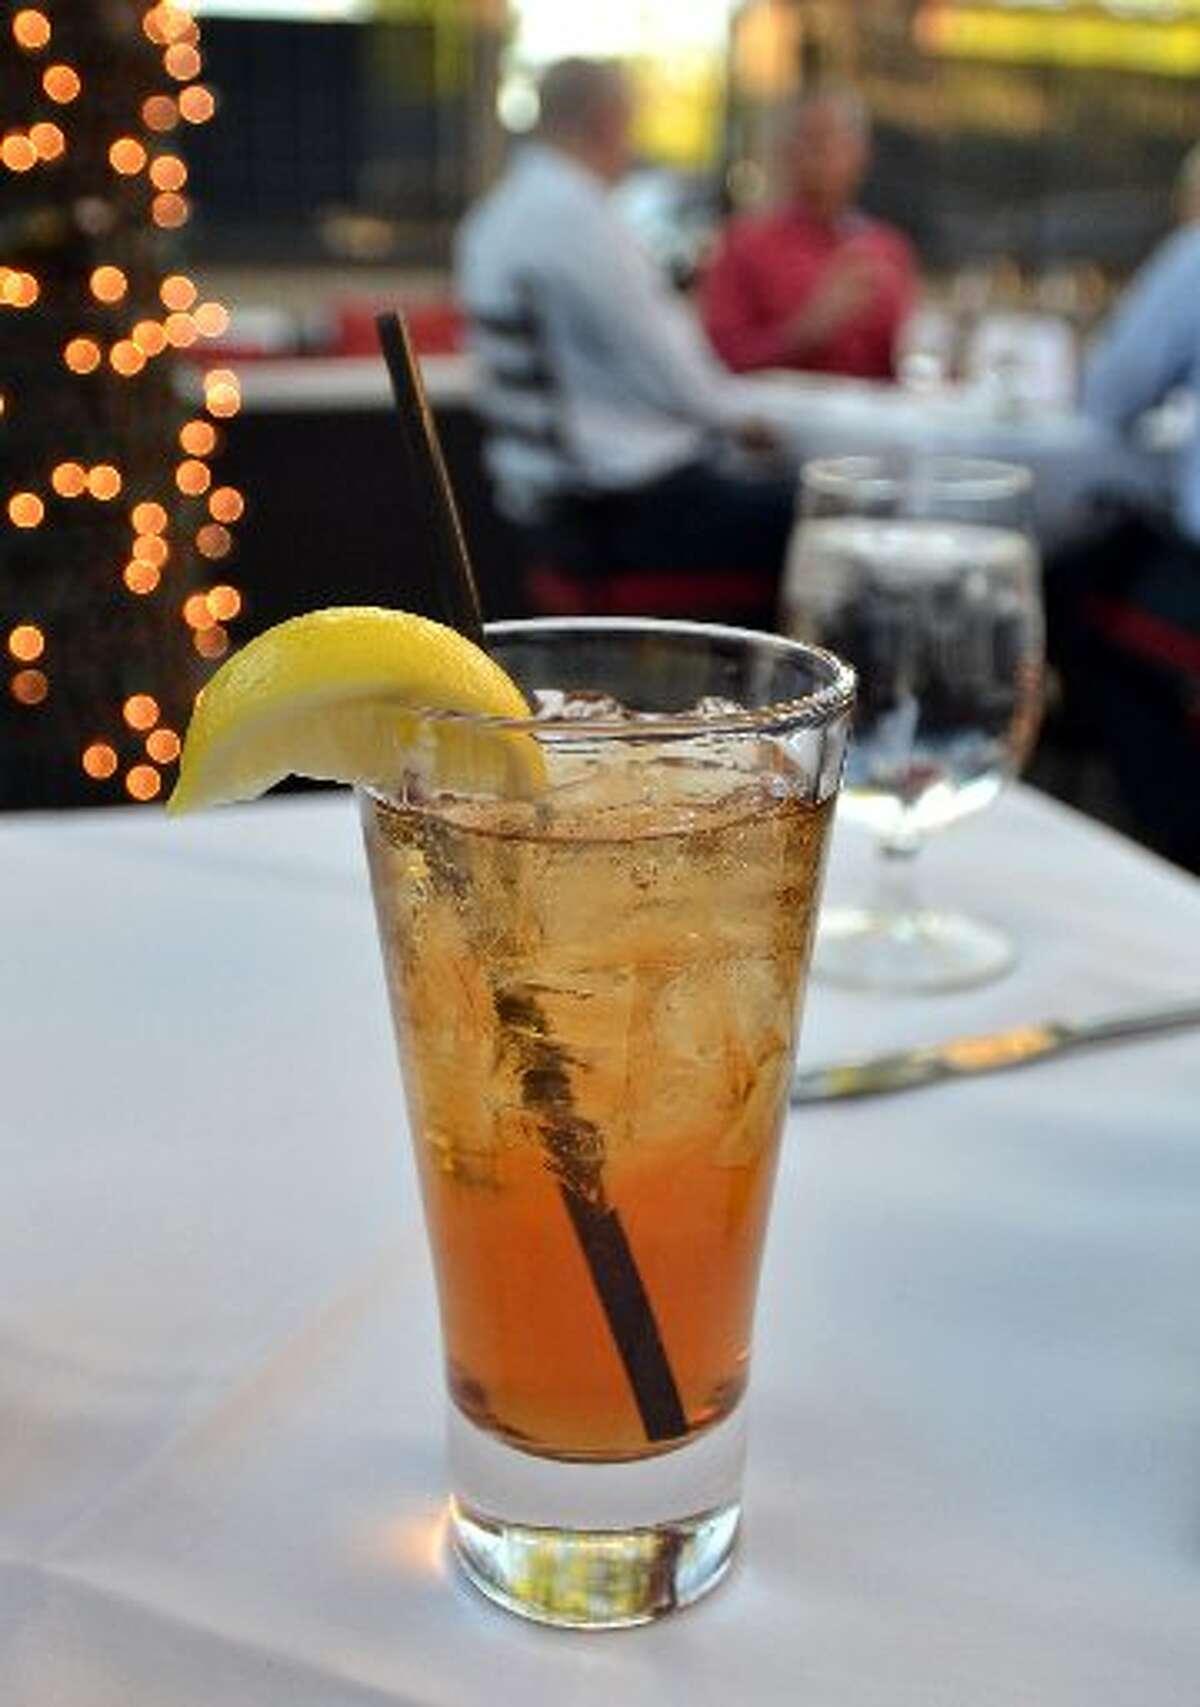 The tasty, refreshing Sweet Eddy Sweet Tea Vodka at the Cabana at the Grill. Beth Rankin/cat5